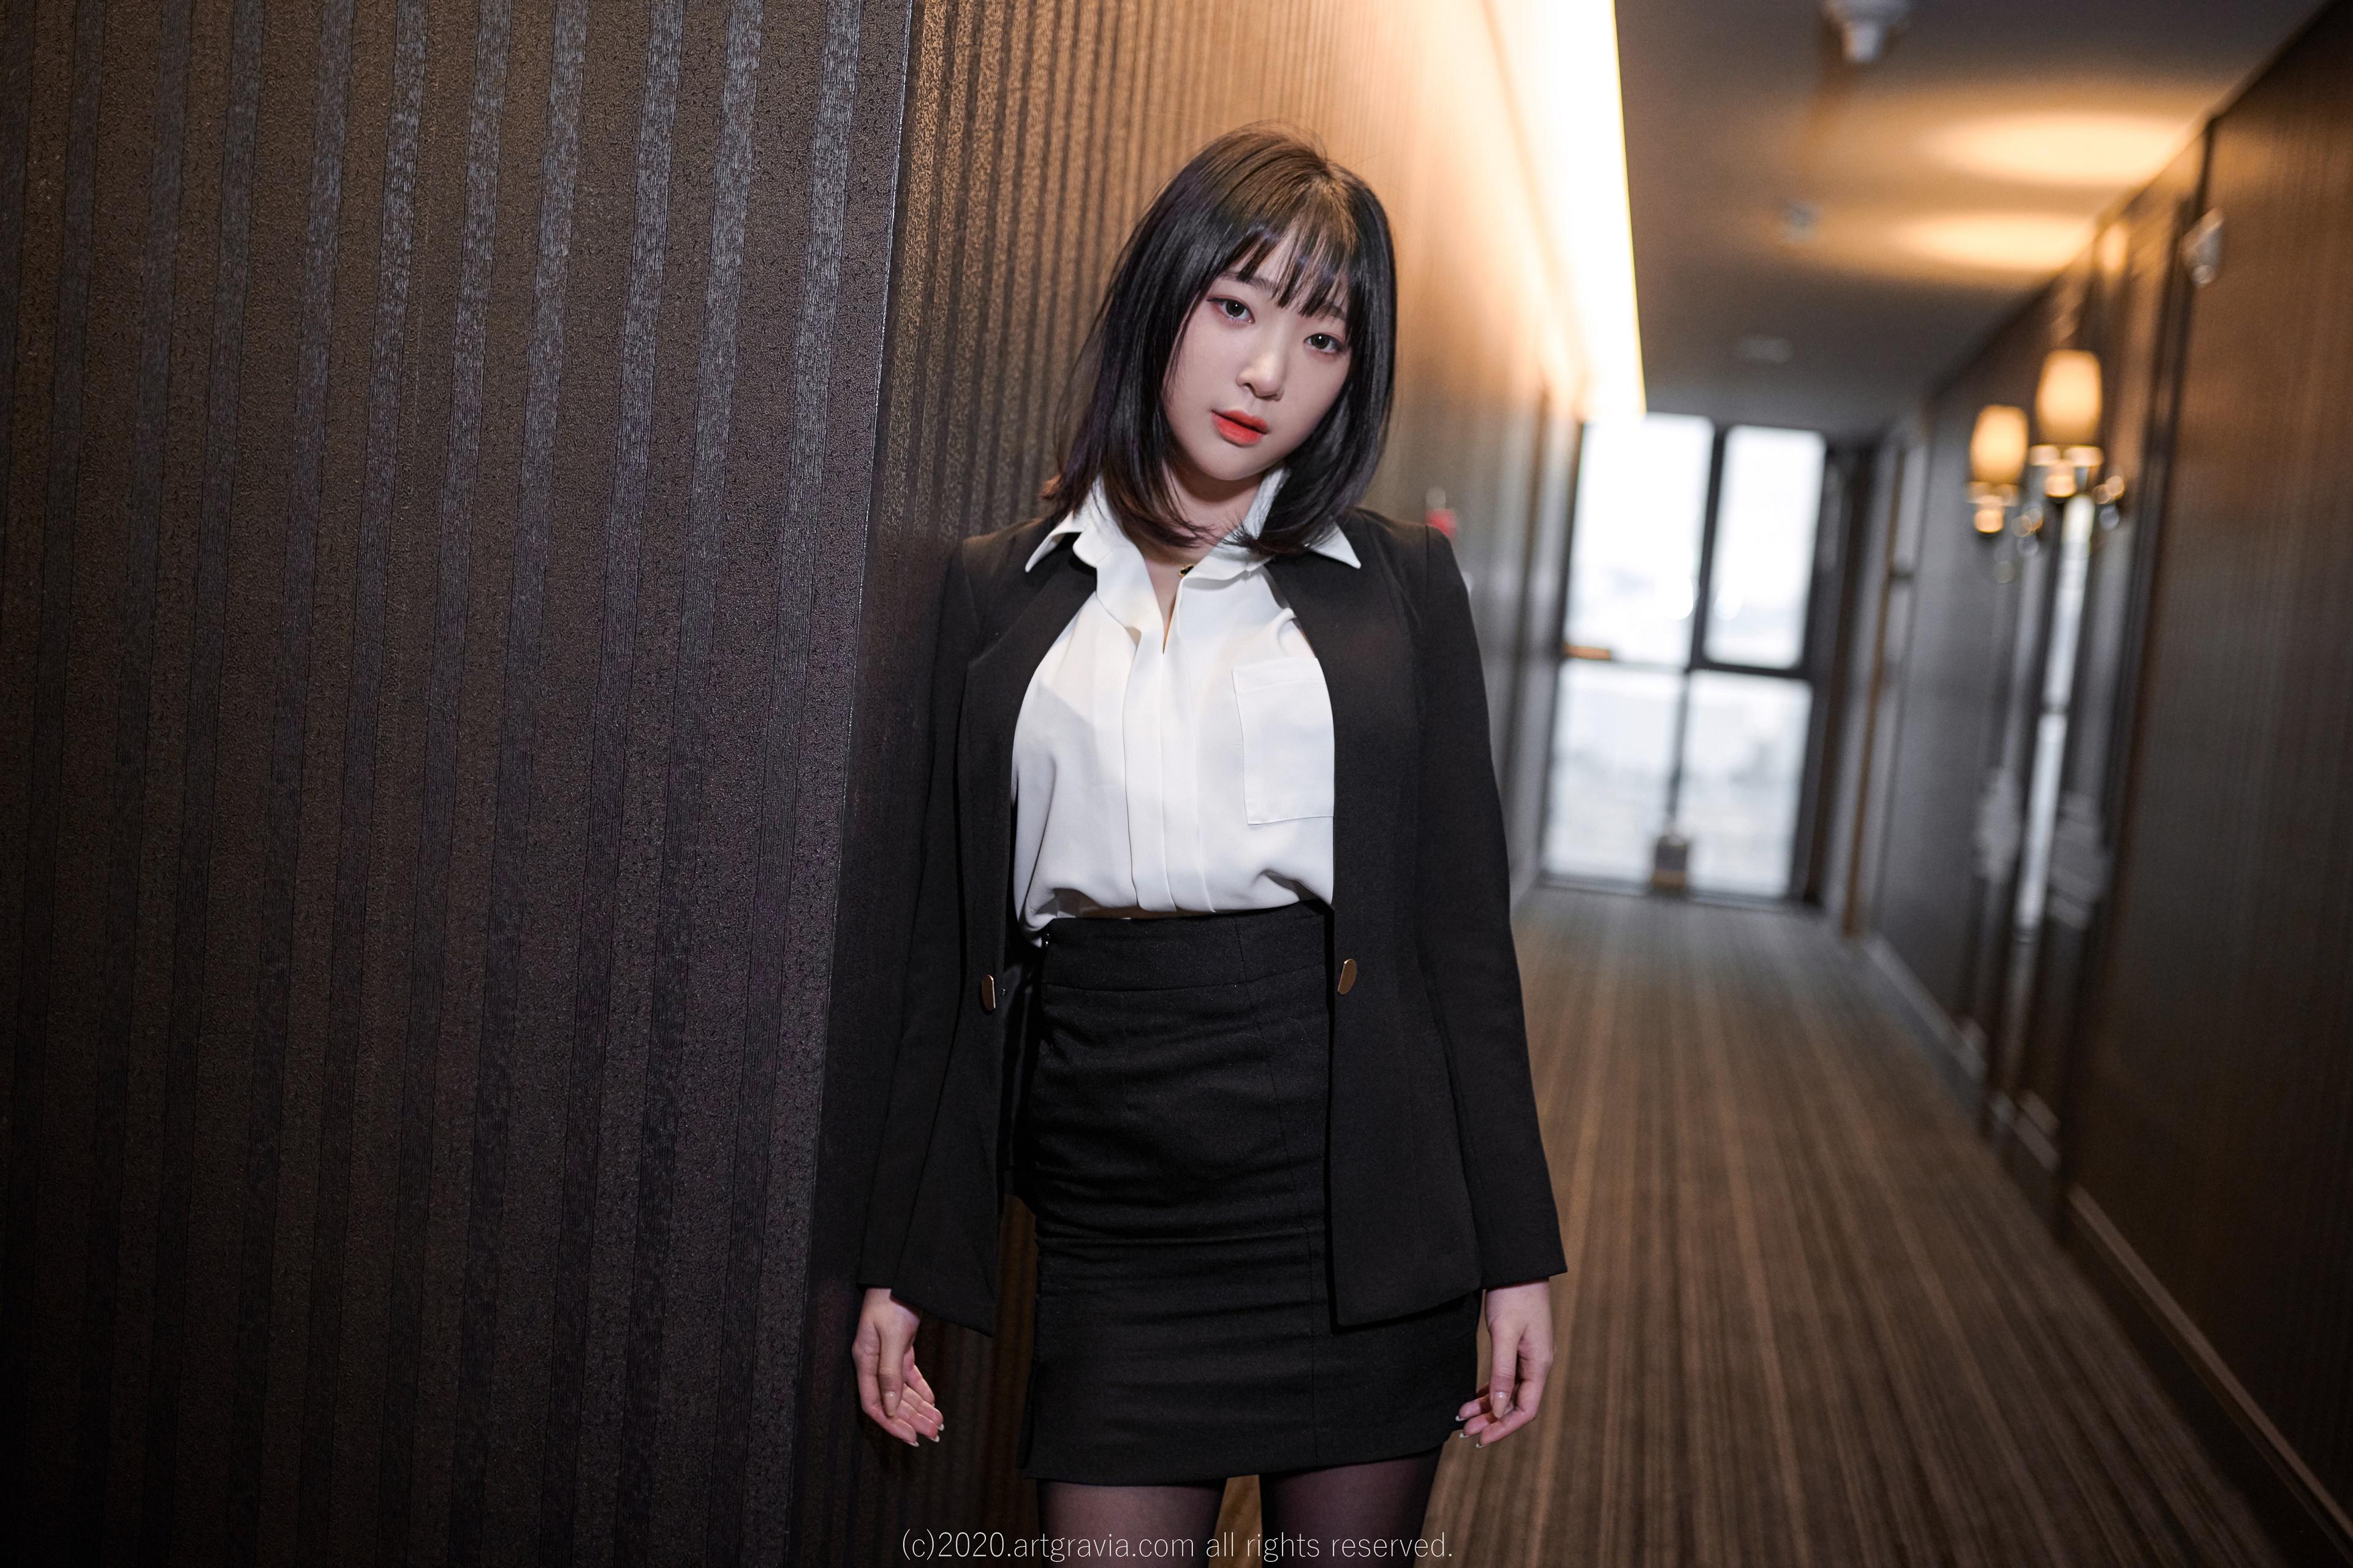 Korean Women Dark Hair Asian Women Women Indoors Looking At Viewer 3840x2559